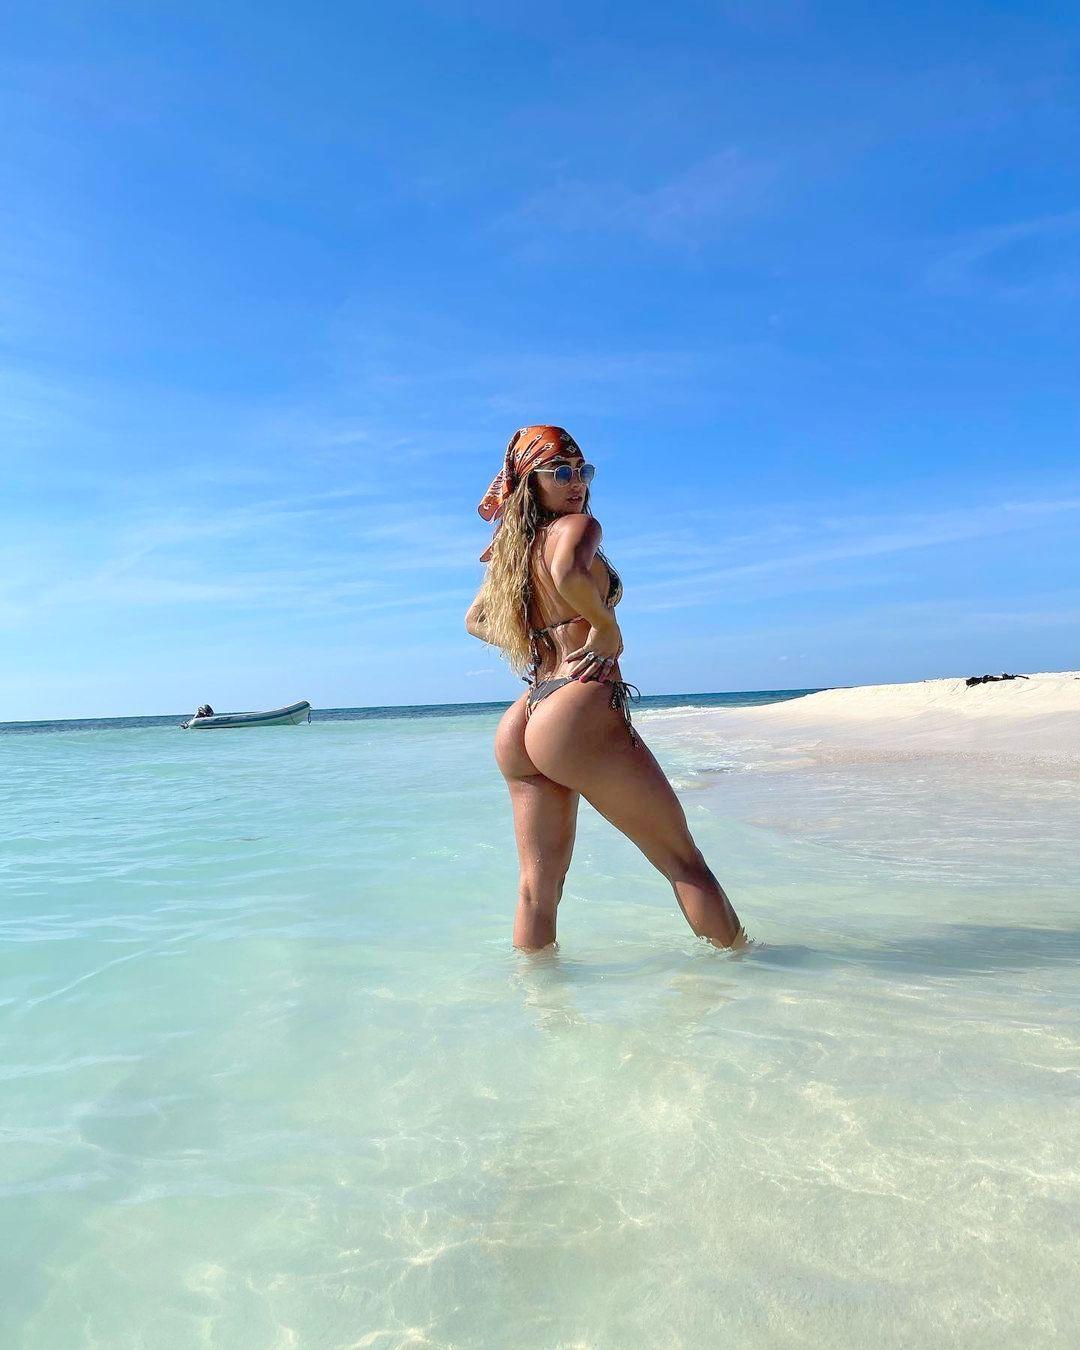 Sommer Ray In Thong Bikini